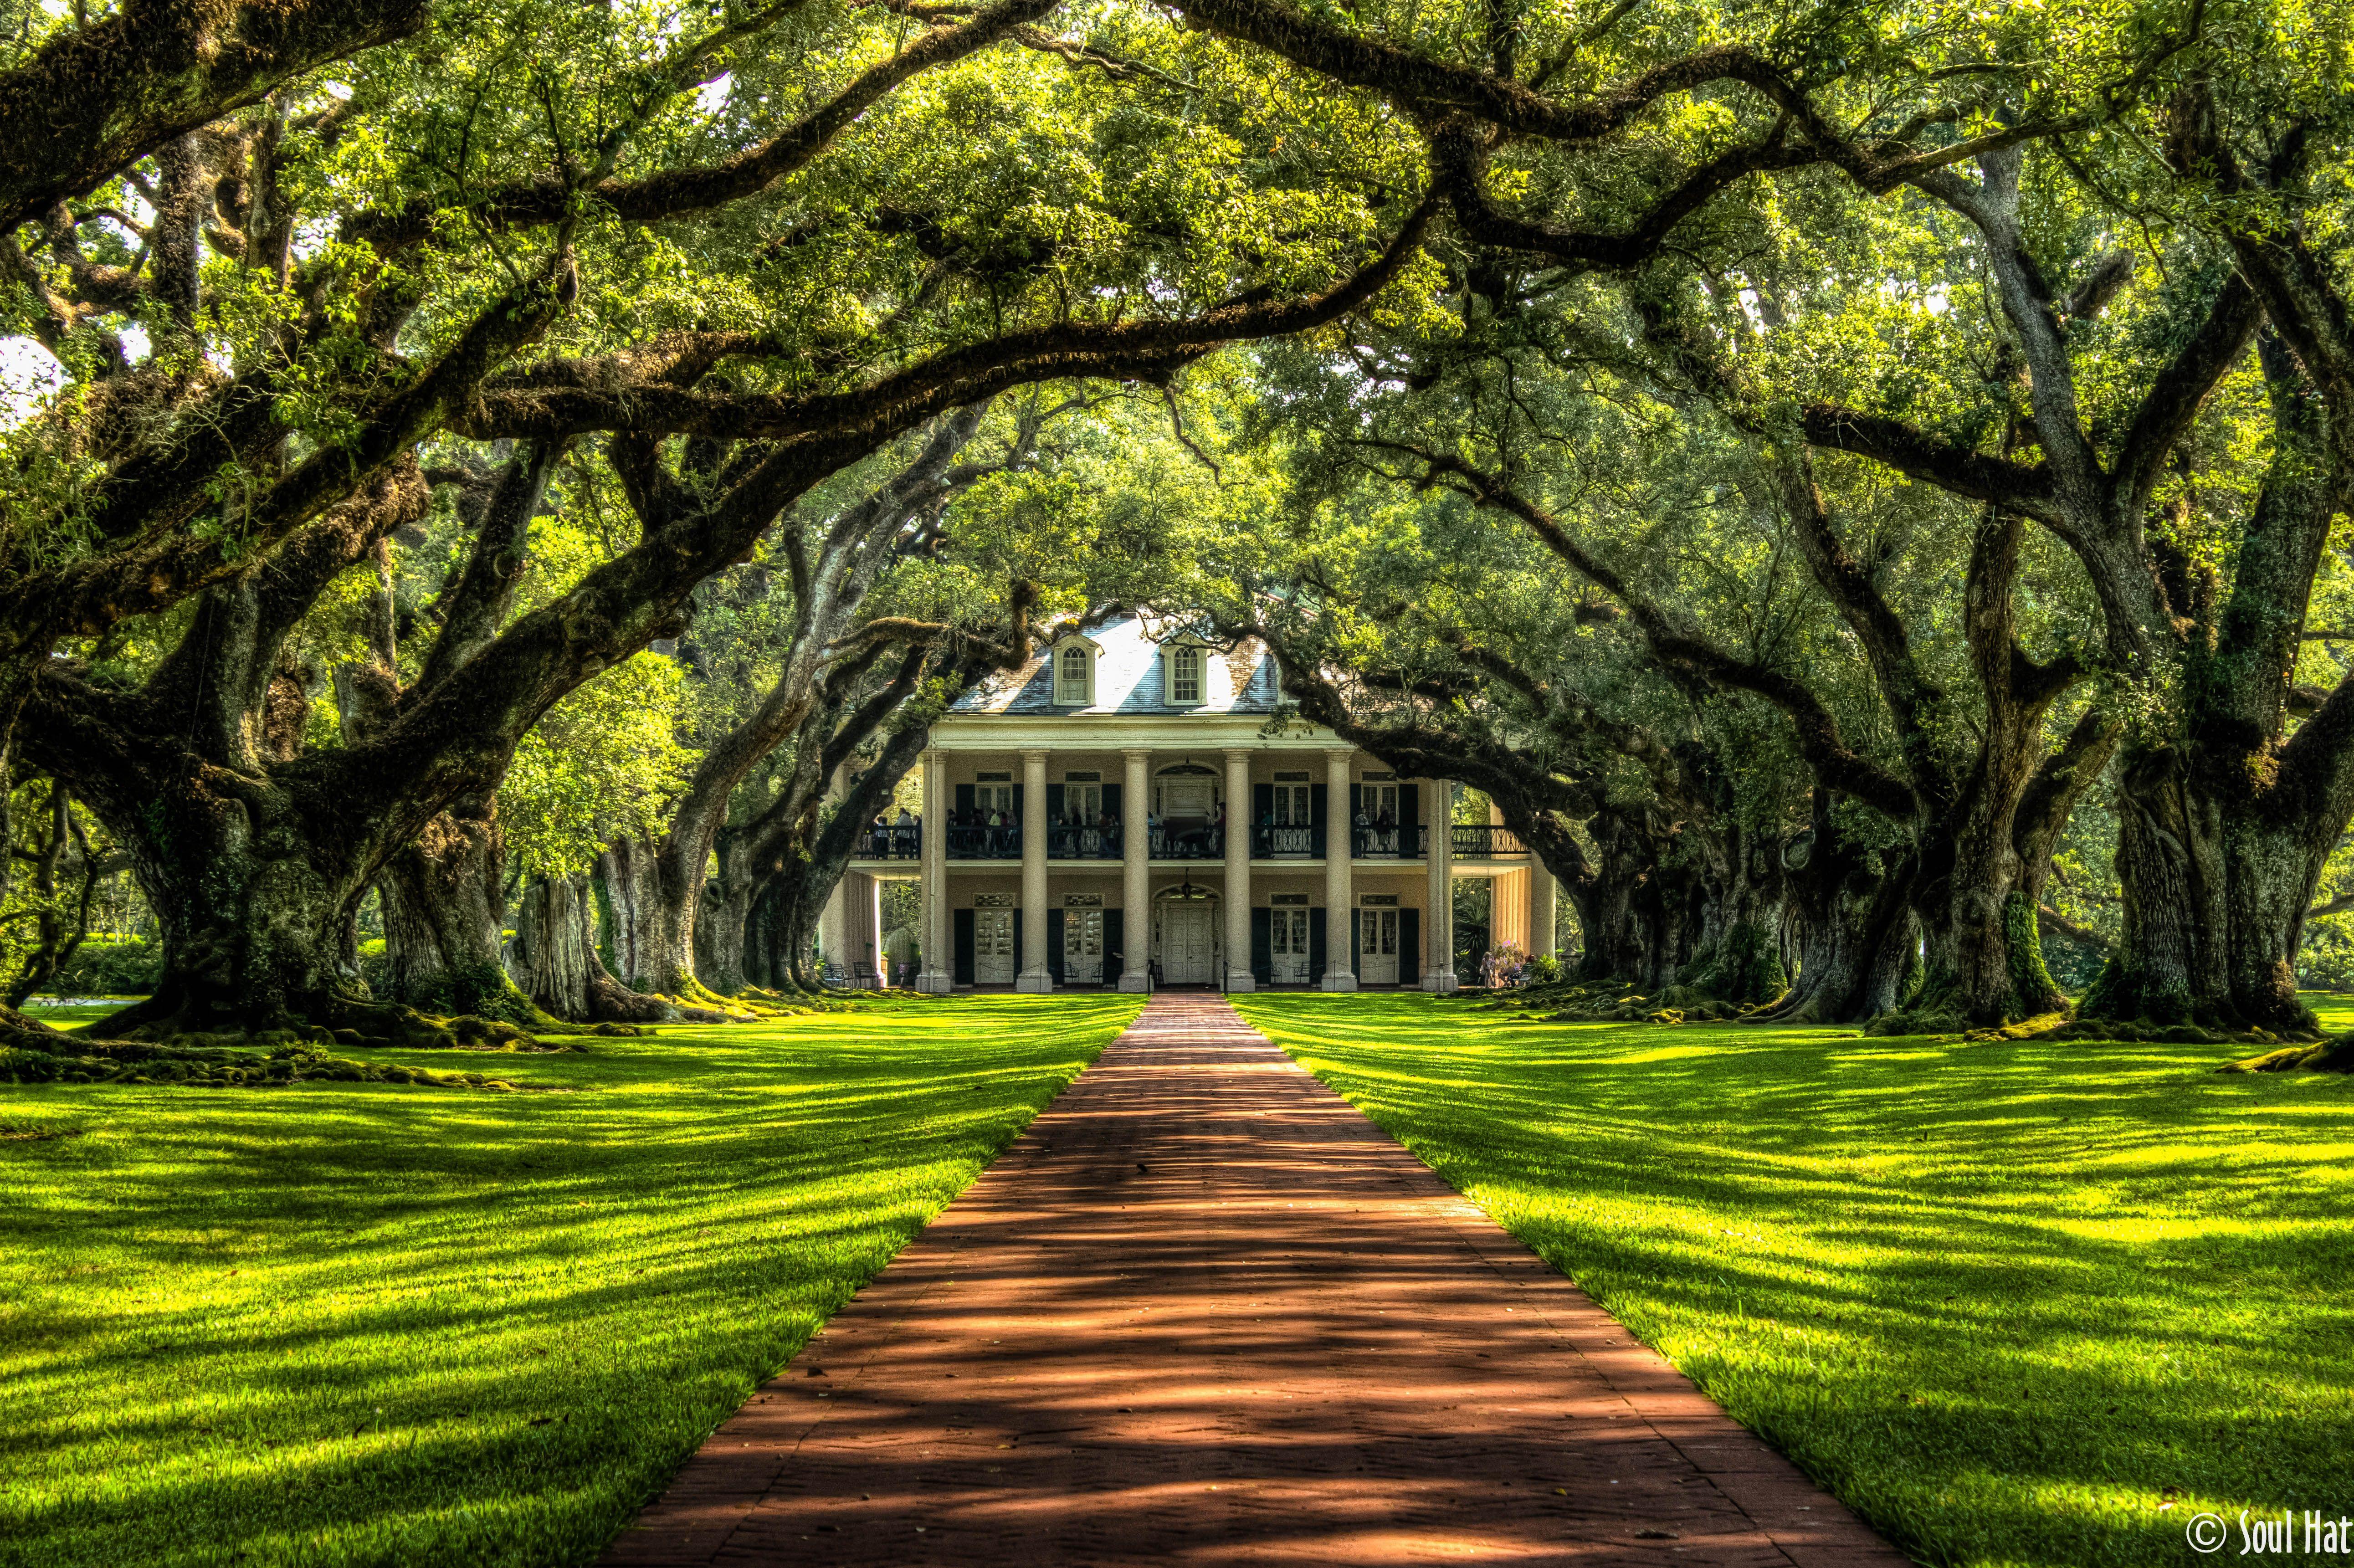 Oak Alley Plantation, Old South Images, Louisiana, Ancient Live Oaks